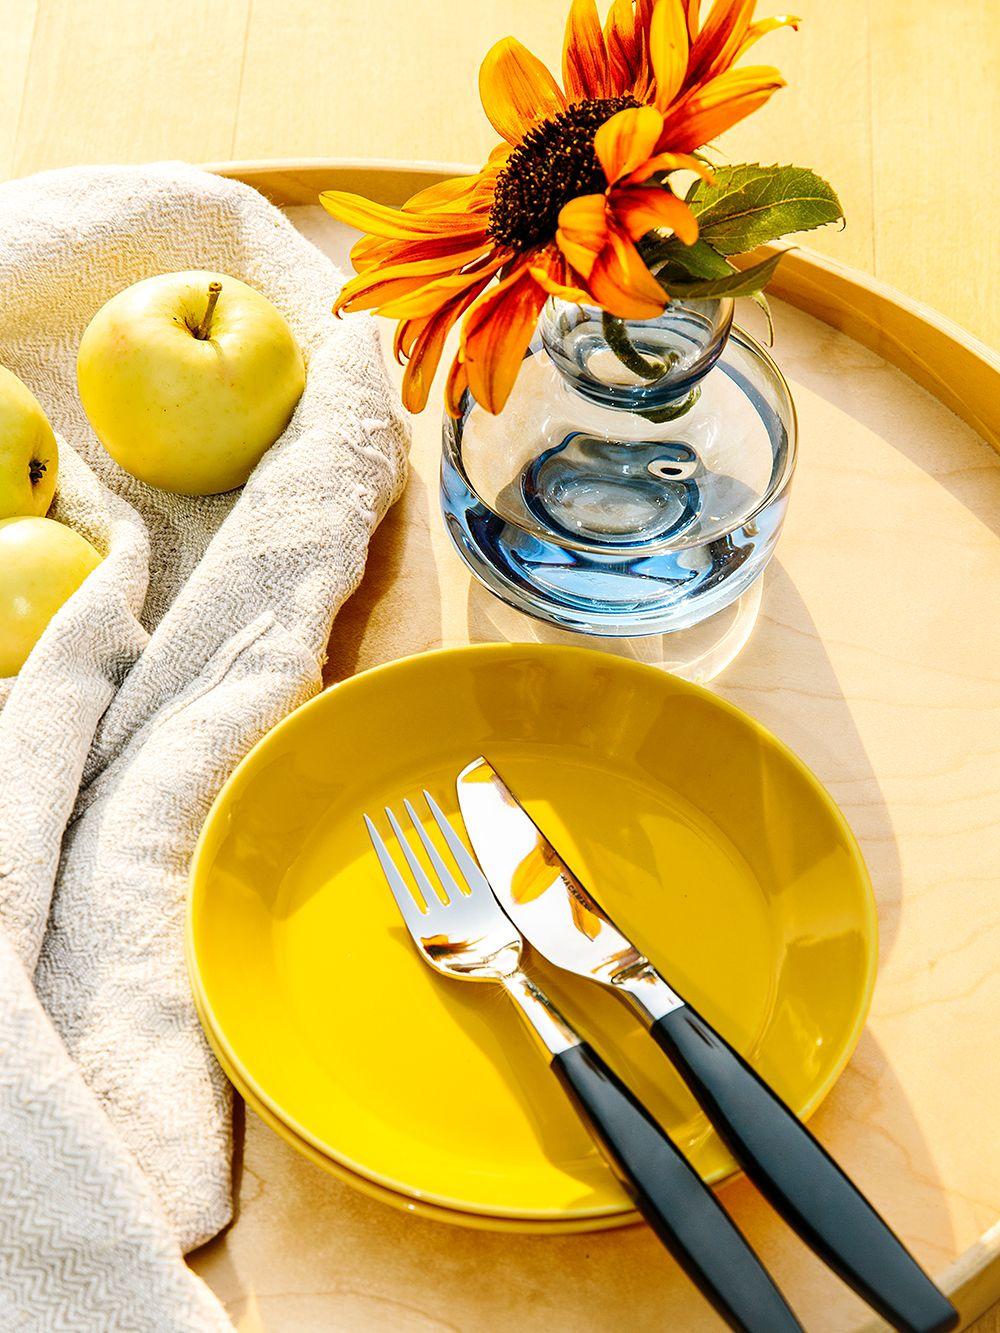 Teema plates in honey by Iittala, blue Flower vase by Marimekko, Lions cutlery by Hackman